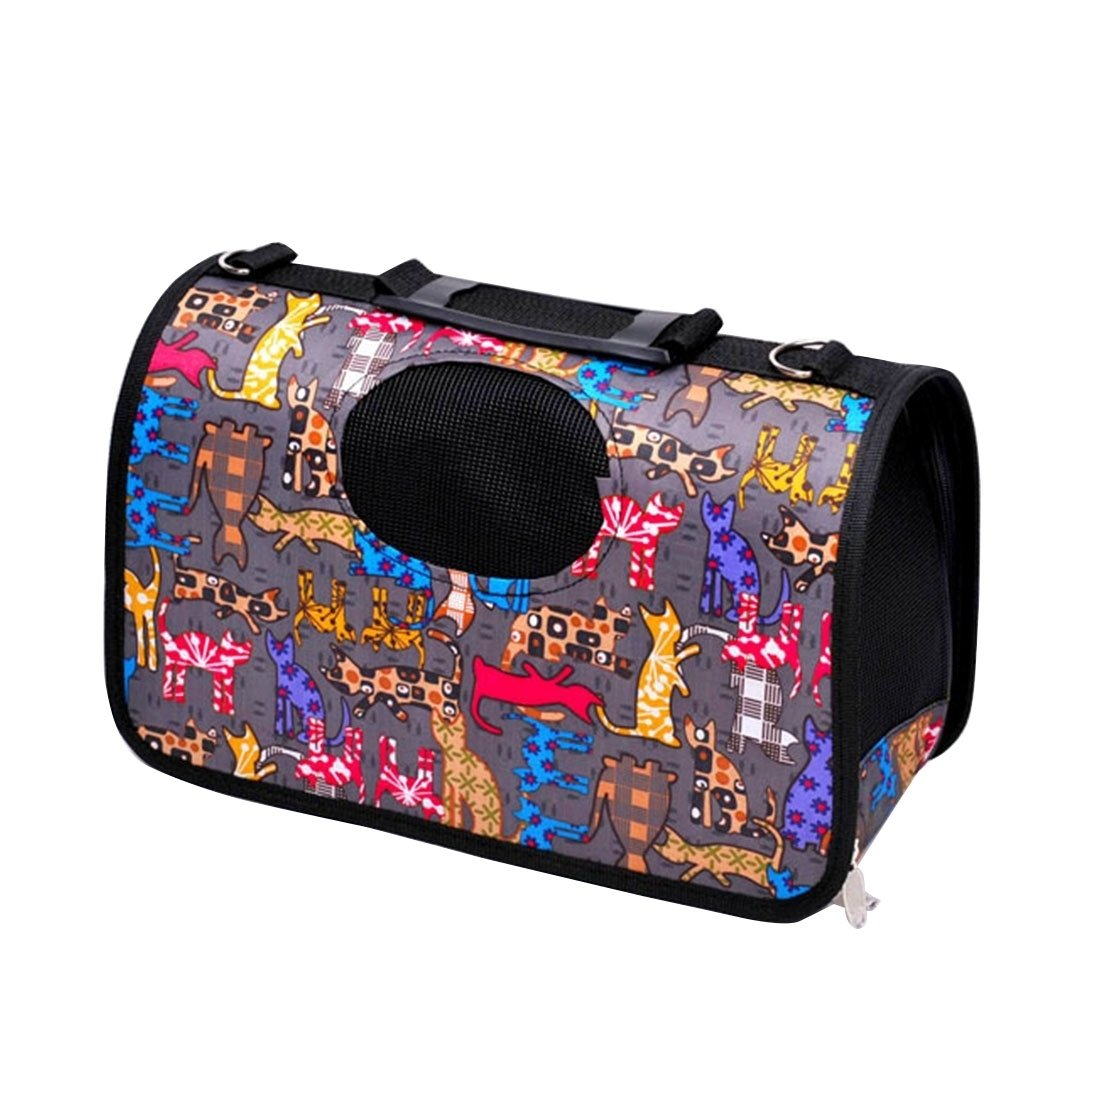 Hc2876m Pet Supplies Portable Pet Handbag Shoulder Bag for Cat Dog and other Pets Large, Size 50  22  30cm (SKU   Hc2876m)